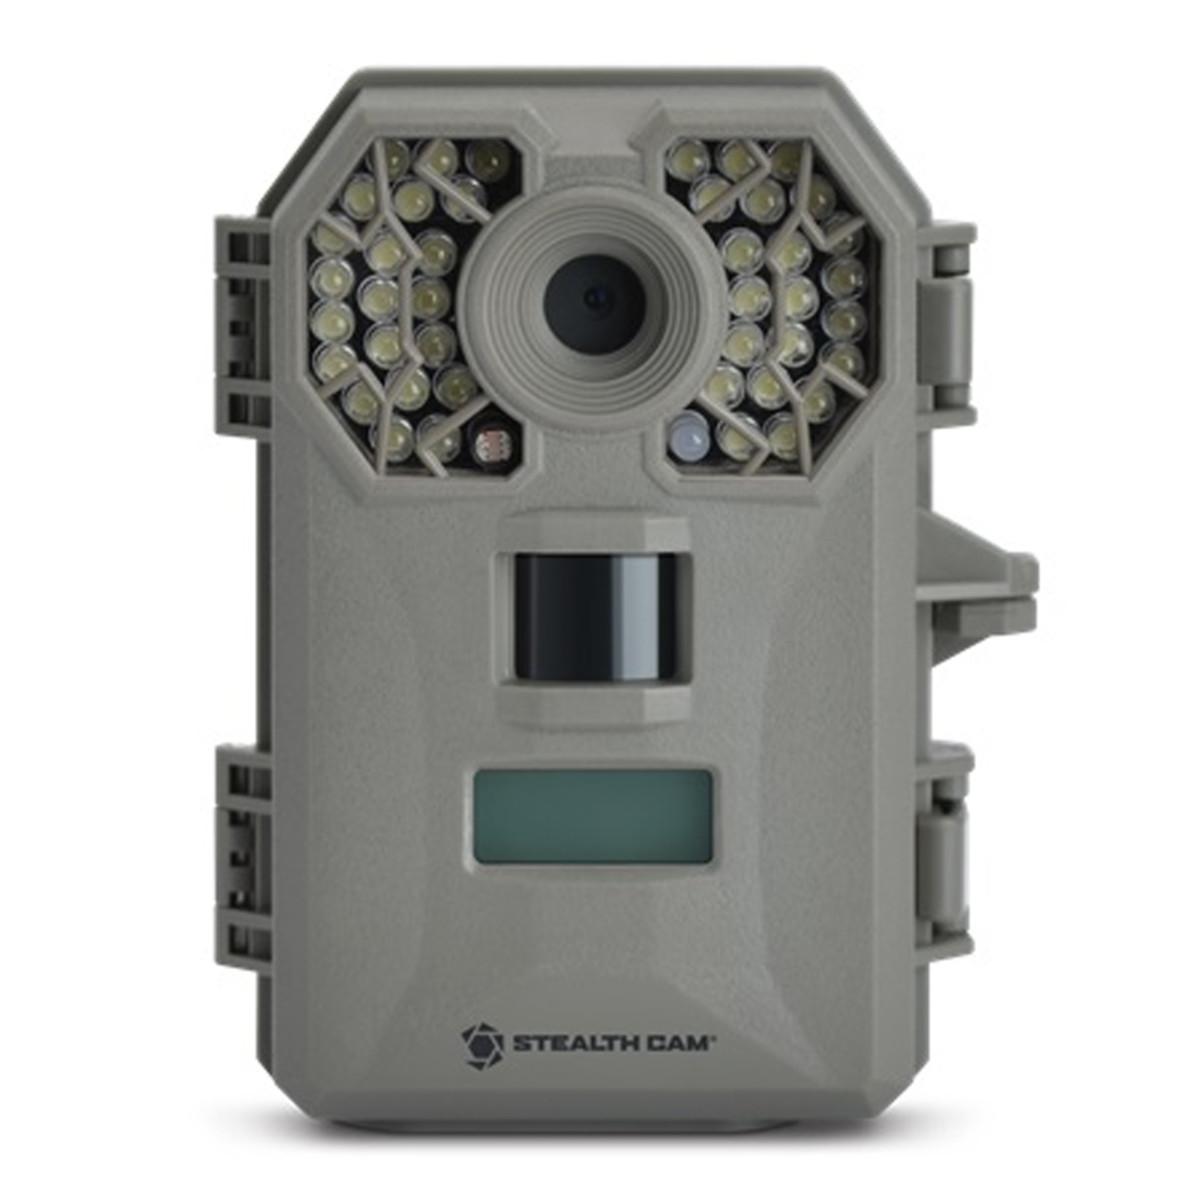 GSM STC G42C Stealth Cam G42 10 MP IR Flash Color Game Camera